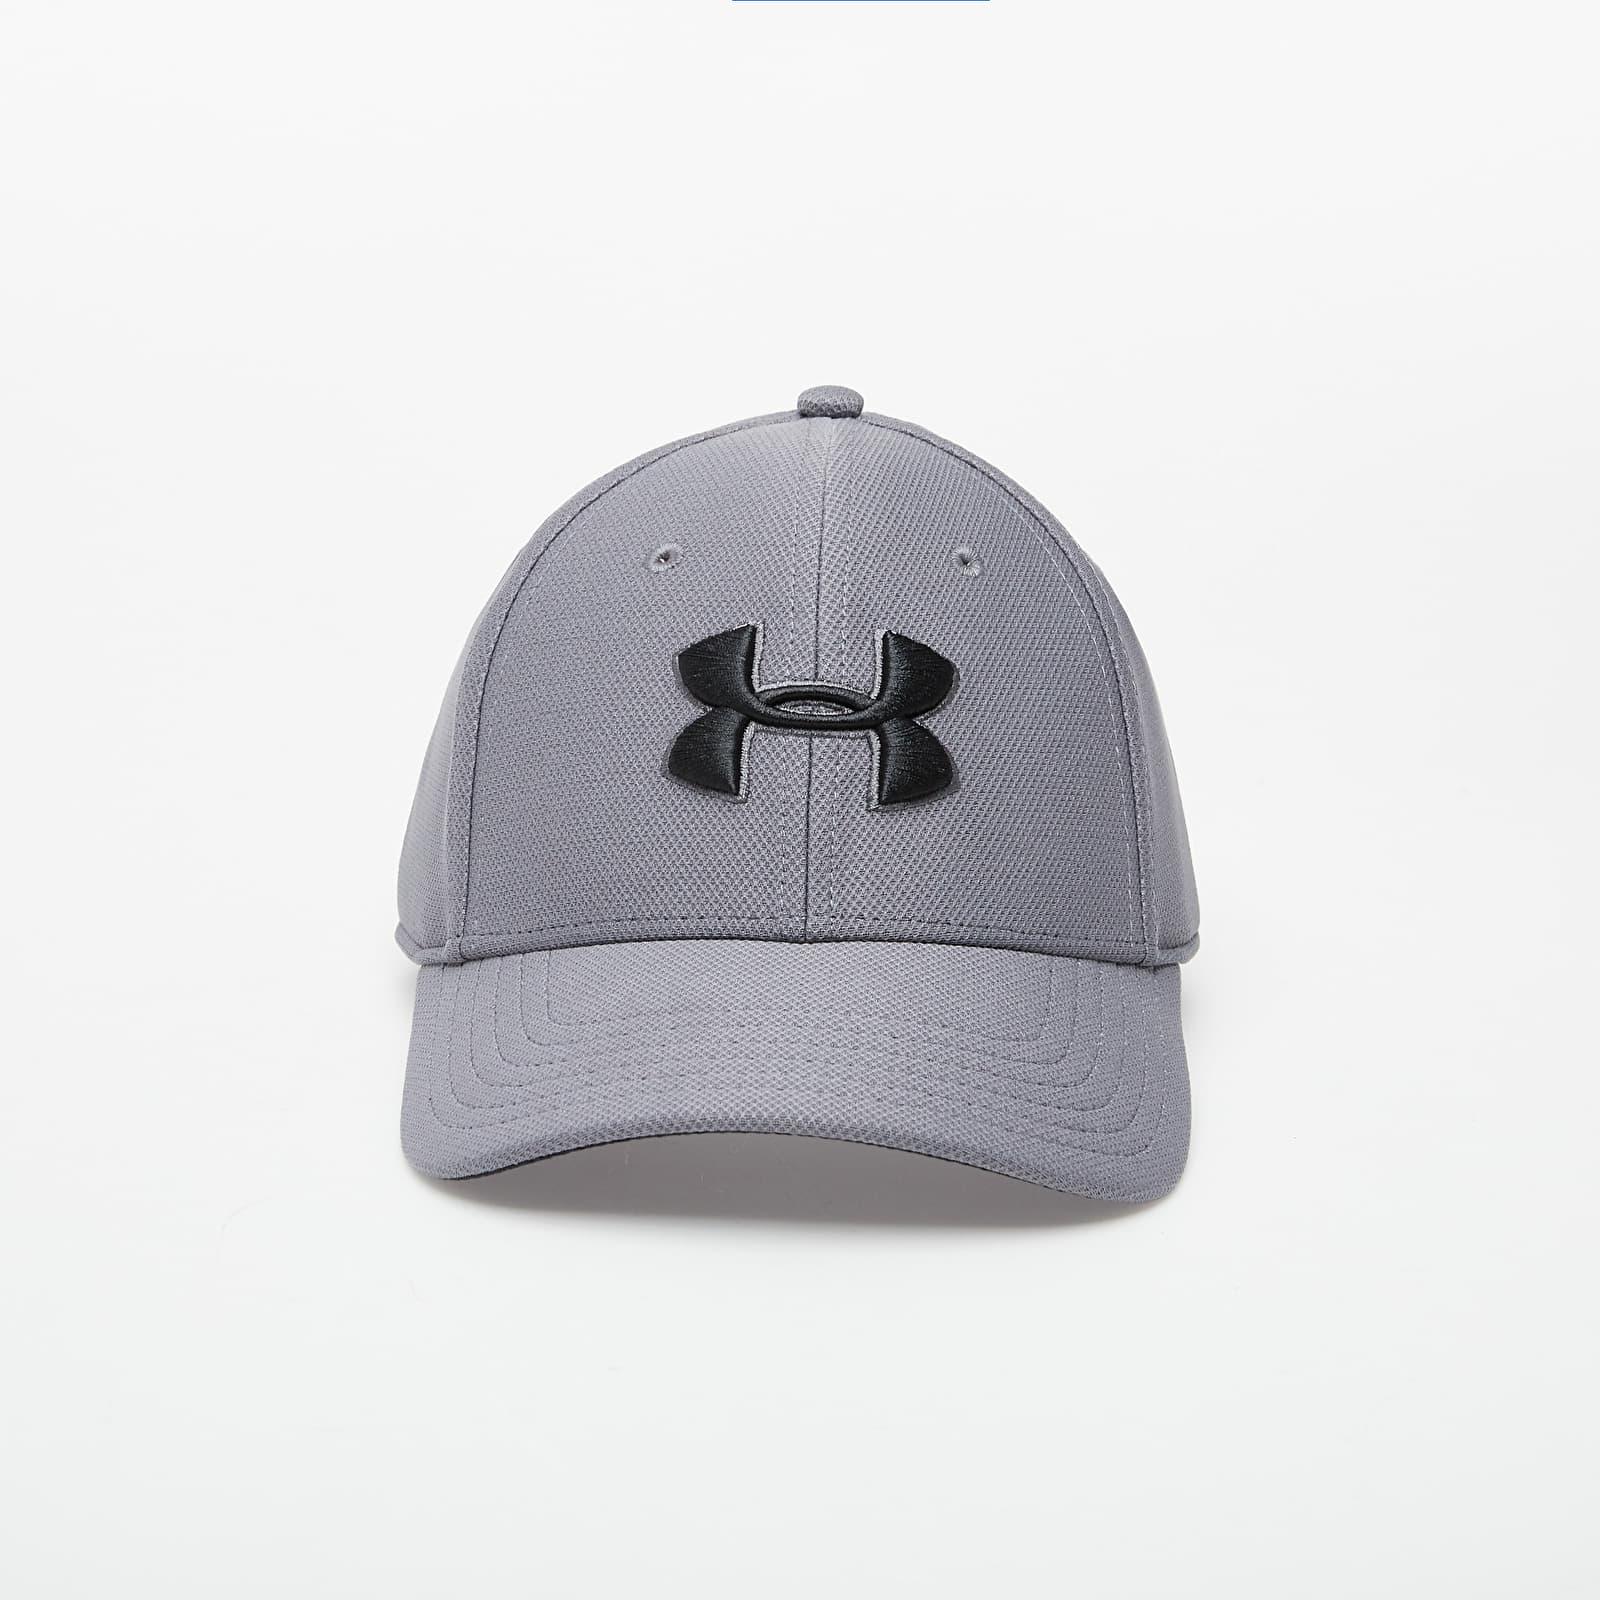 Caps Under Armour Blitzing 3.0 Cap Grey